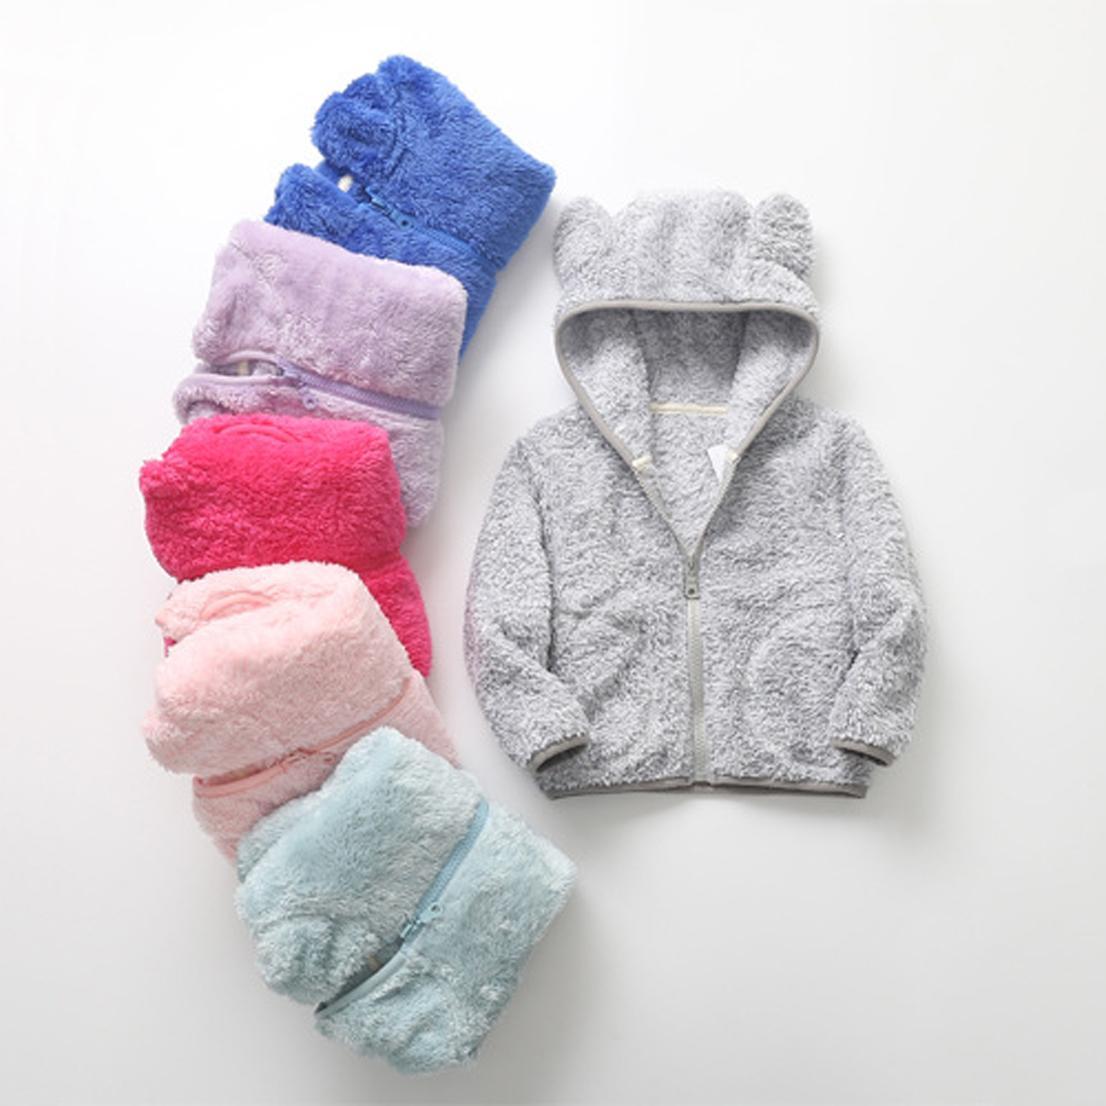 Kinderbär Ohren Form Coral Fleece Langarm-Fest Jacke Sweatshirt Outwear mit Tasche